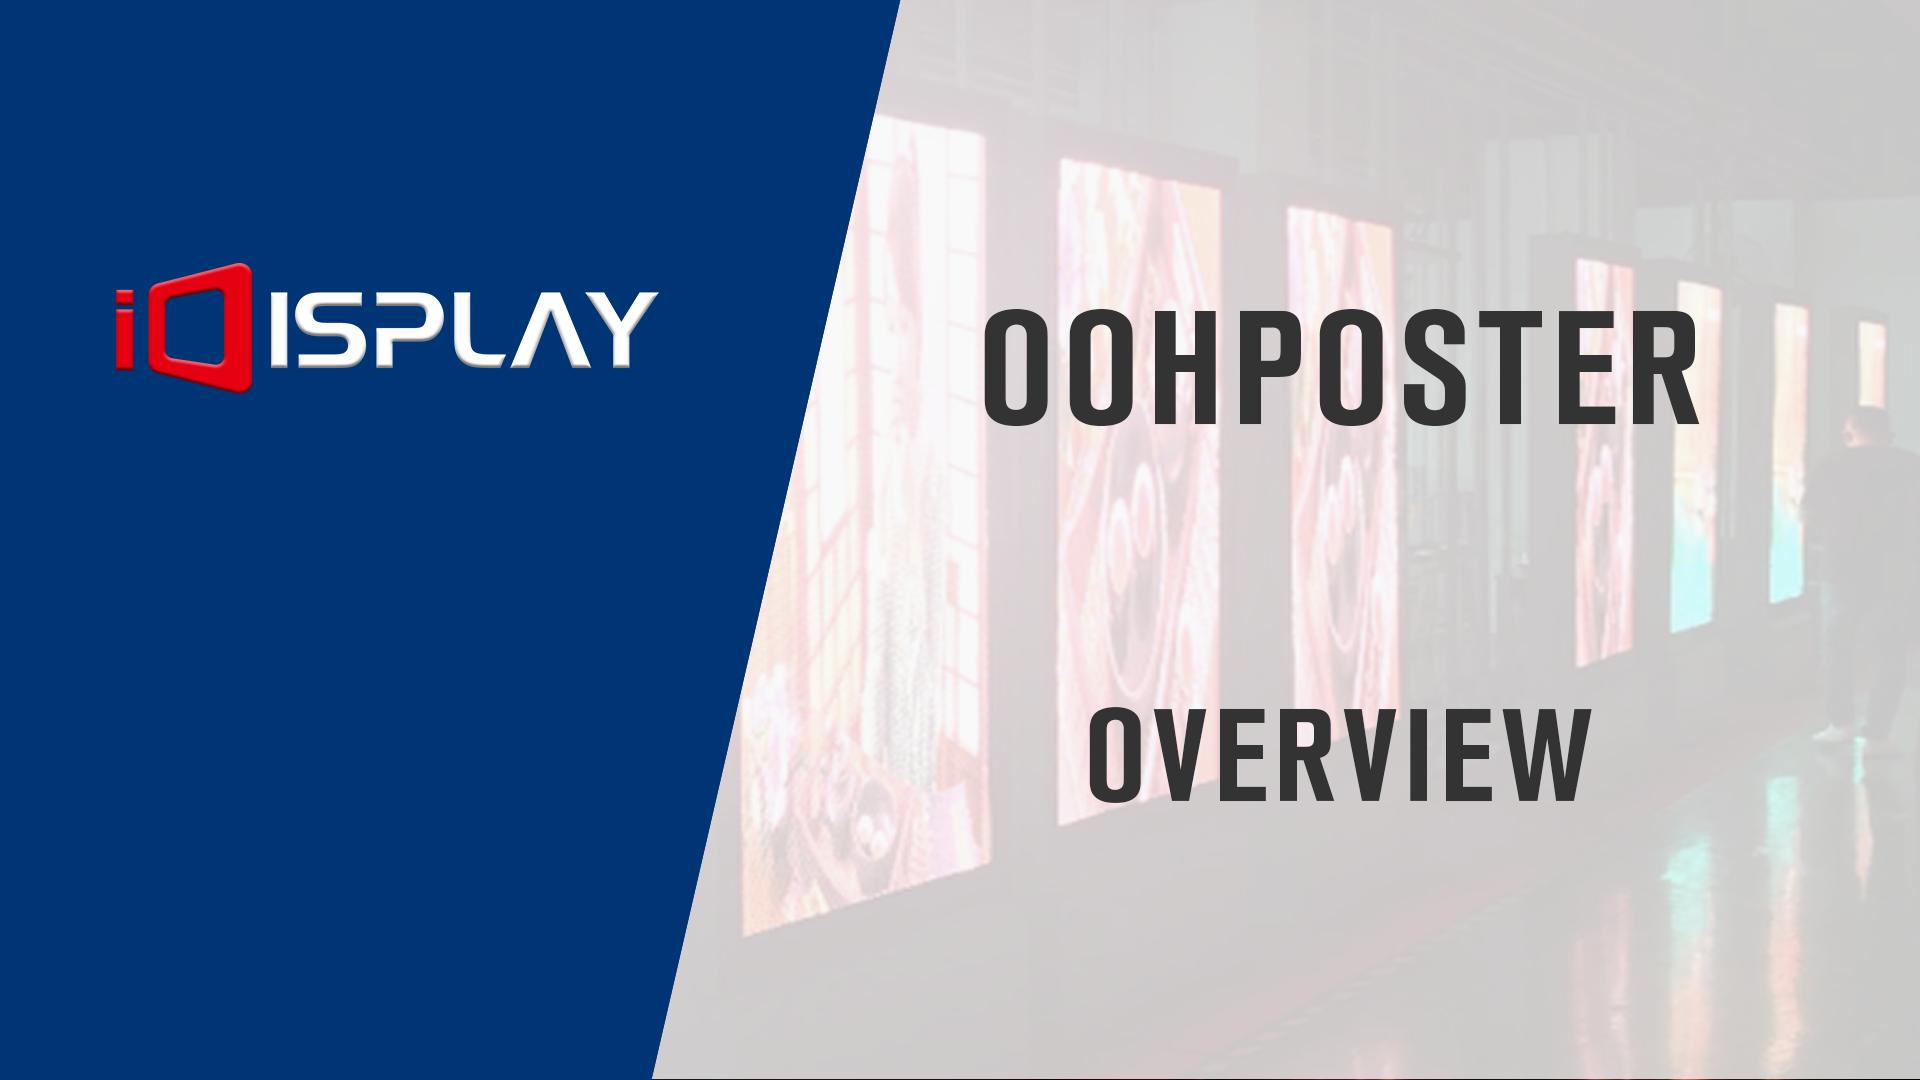 OOHPosterの概要-屋外LEDディスプレイiDisplay